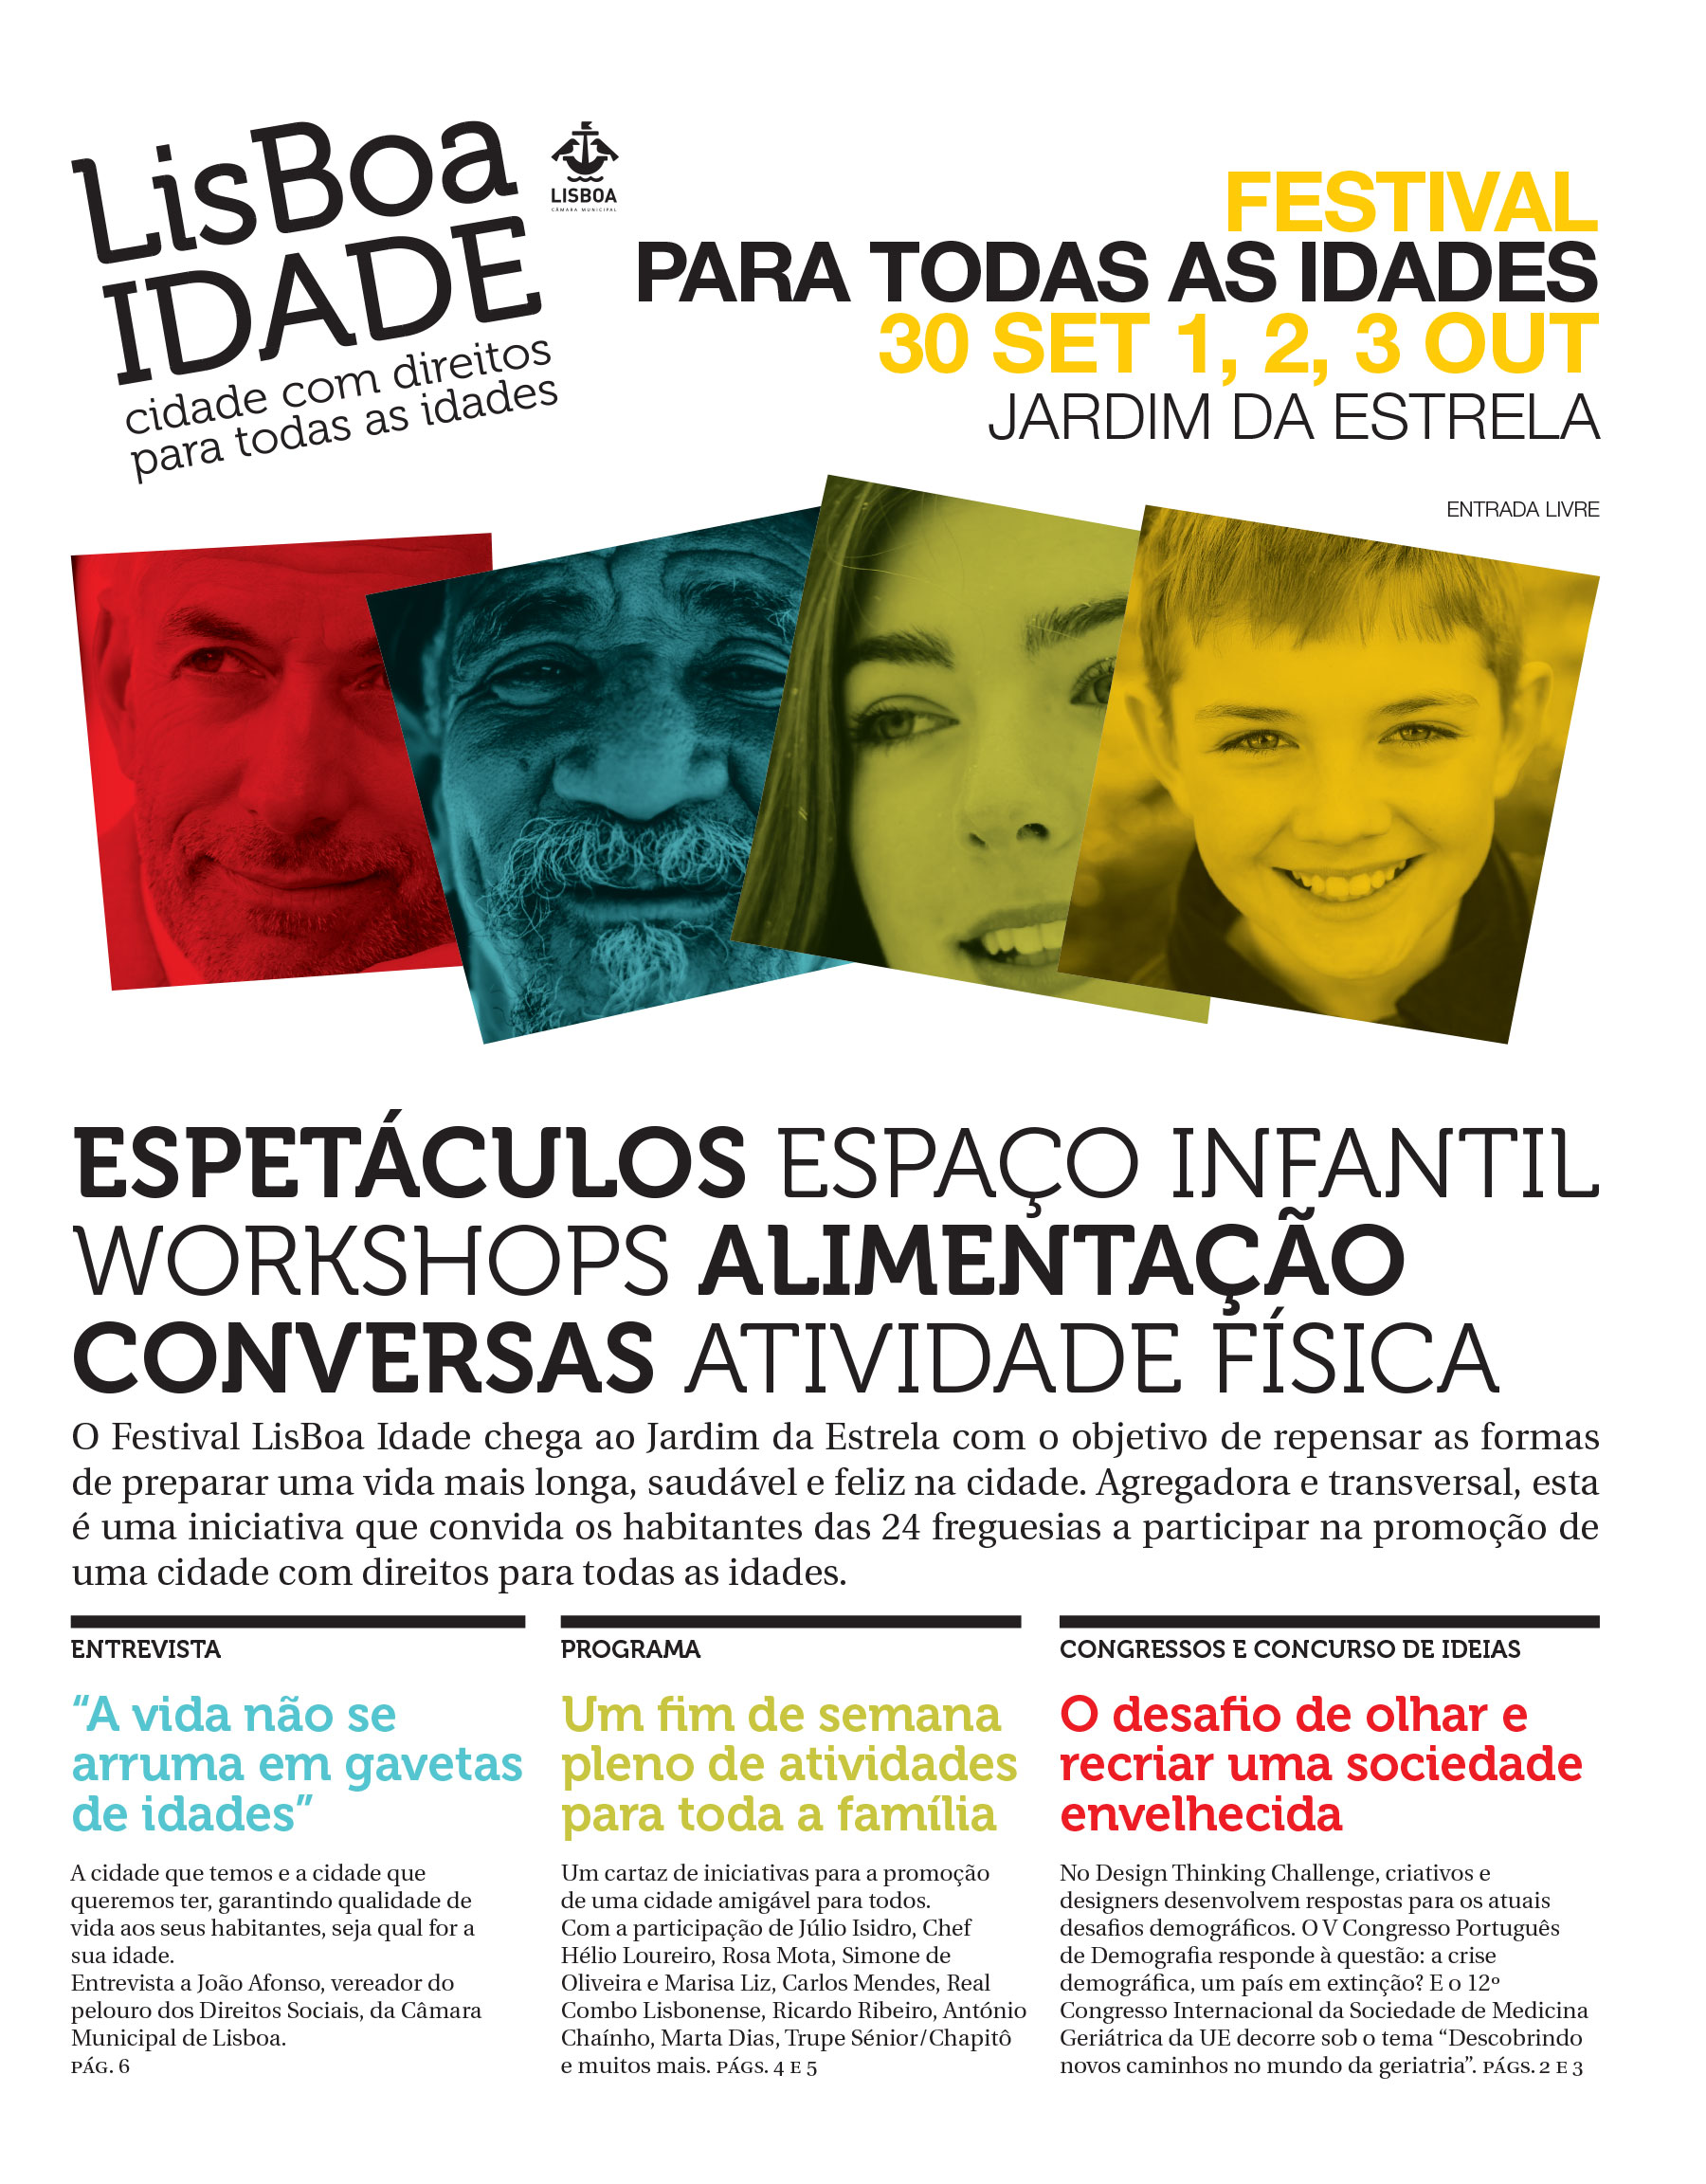 Festival LisboaIdade 2016 - jornal